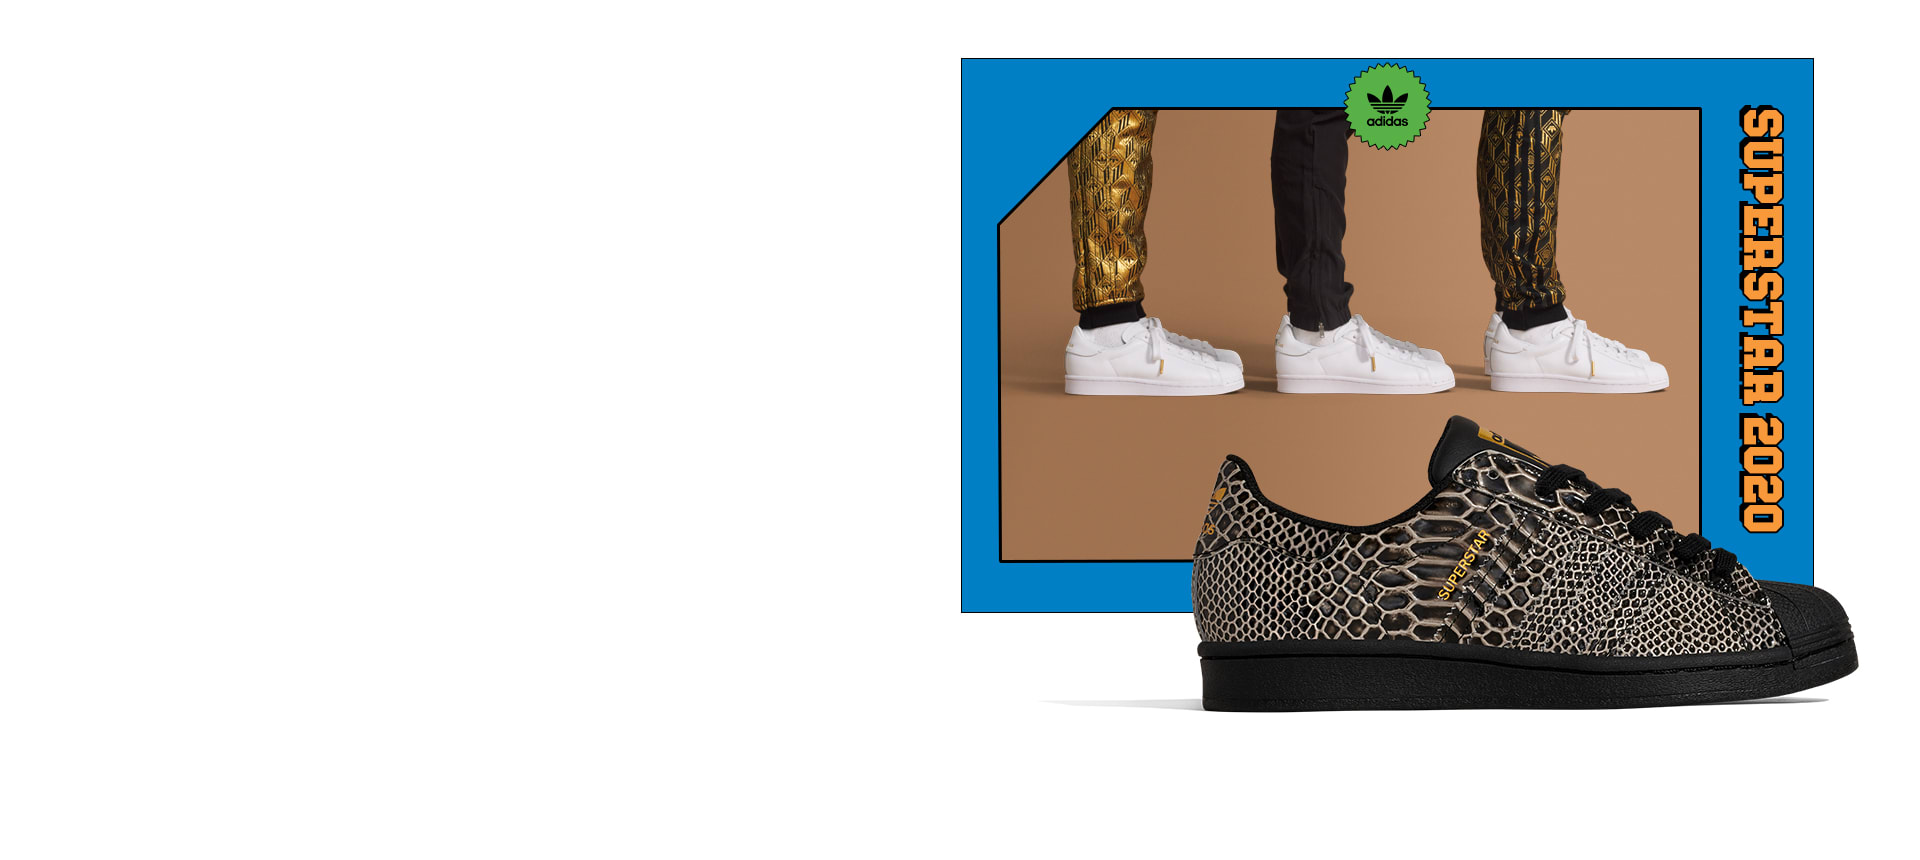 Adidas Originals Shoes New Collection website